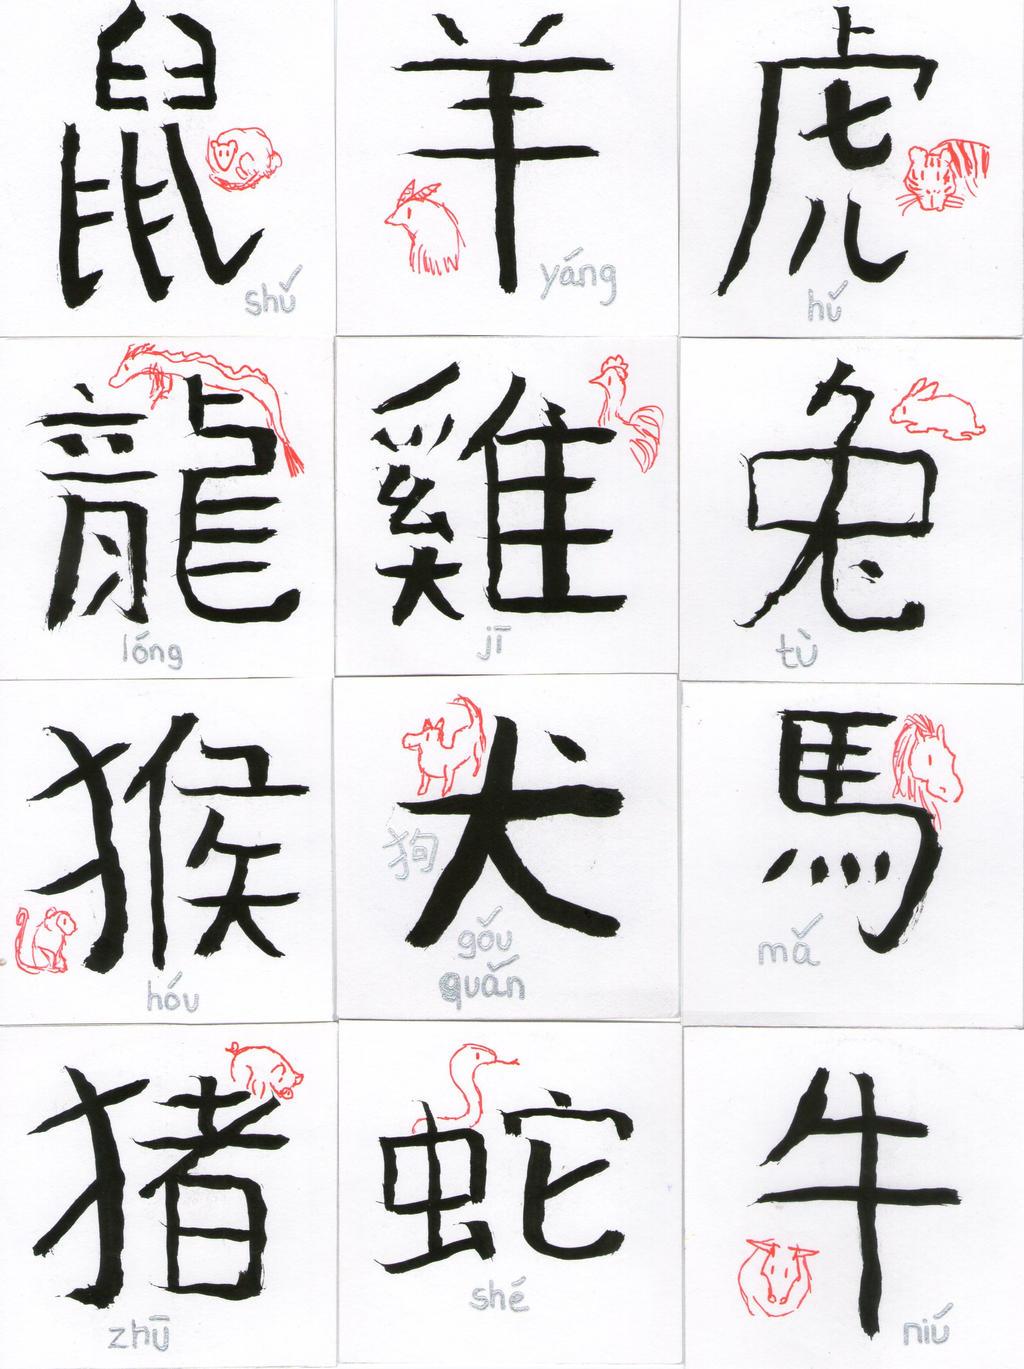 12 Zodiac Animals Chinese Symbols Pronounciation By Haru272 On